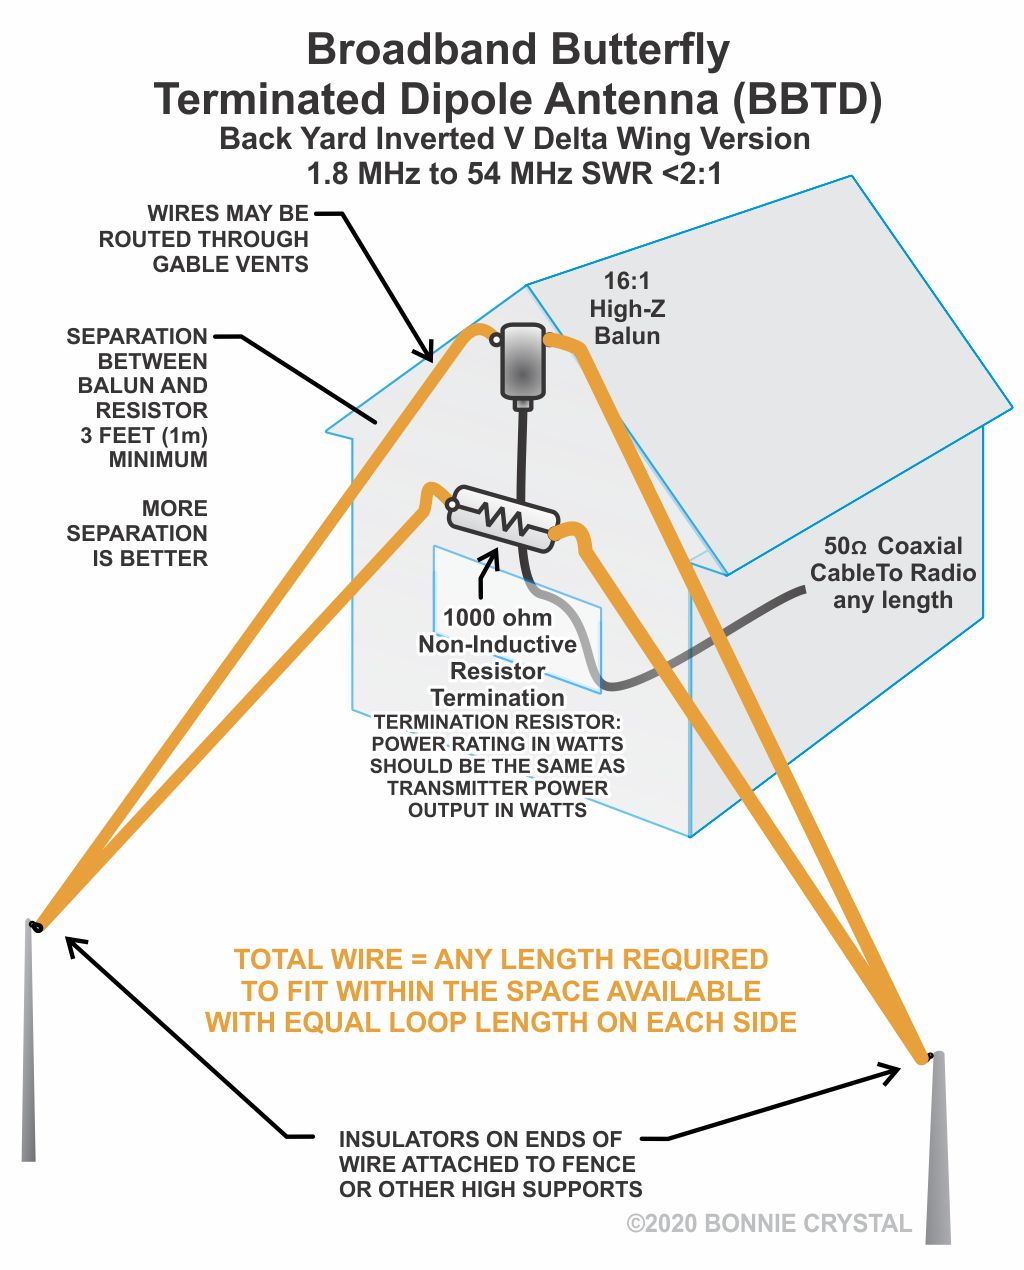 Broadband Butterfly Terminated Dipole Antenna BBTD Back Yard Inverted V Delta Wing version